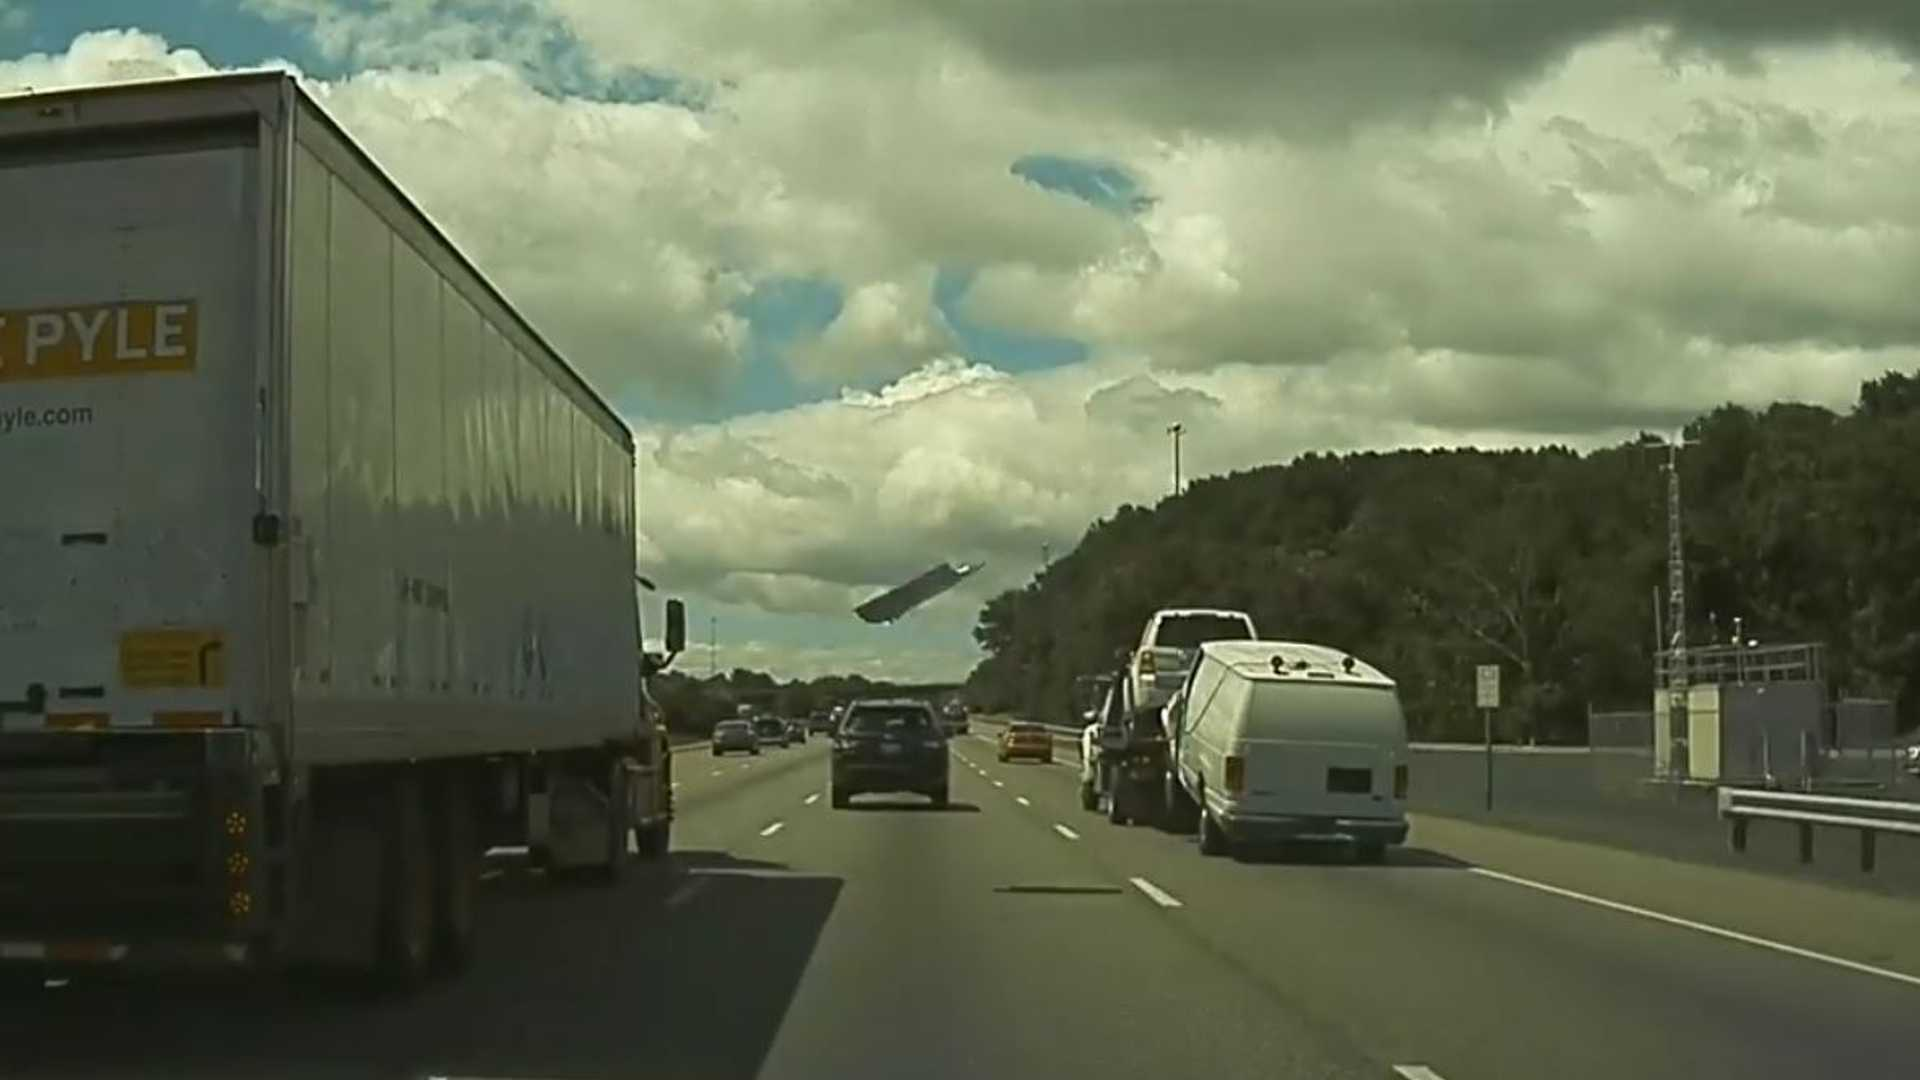 Tesla Dashcam Captures Unsafe Towing, Flying Debris Hits Semi: Video